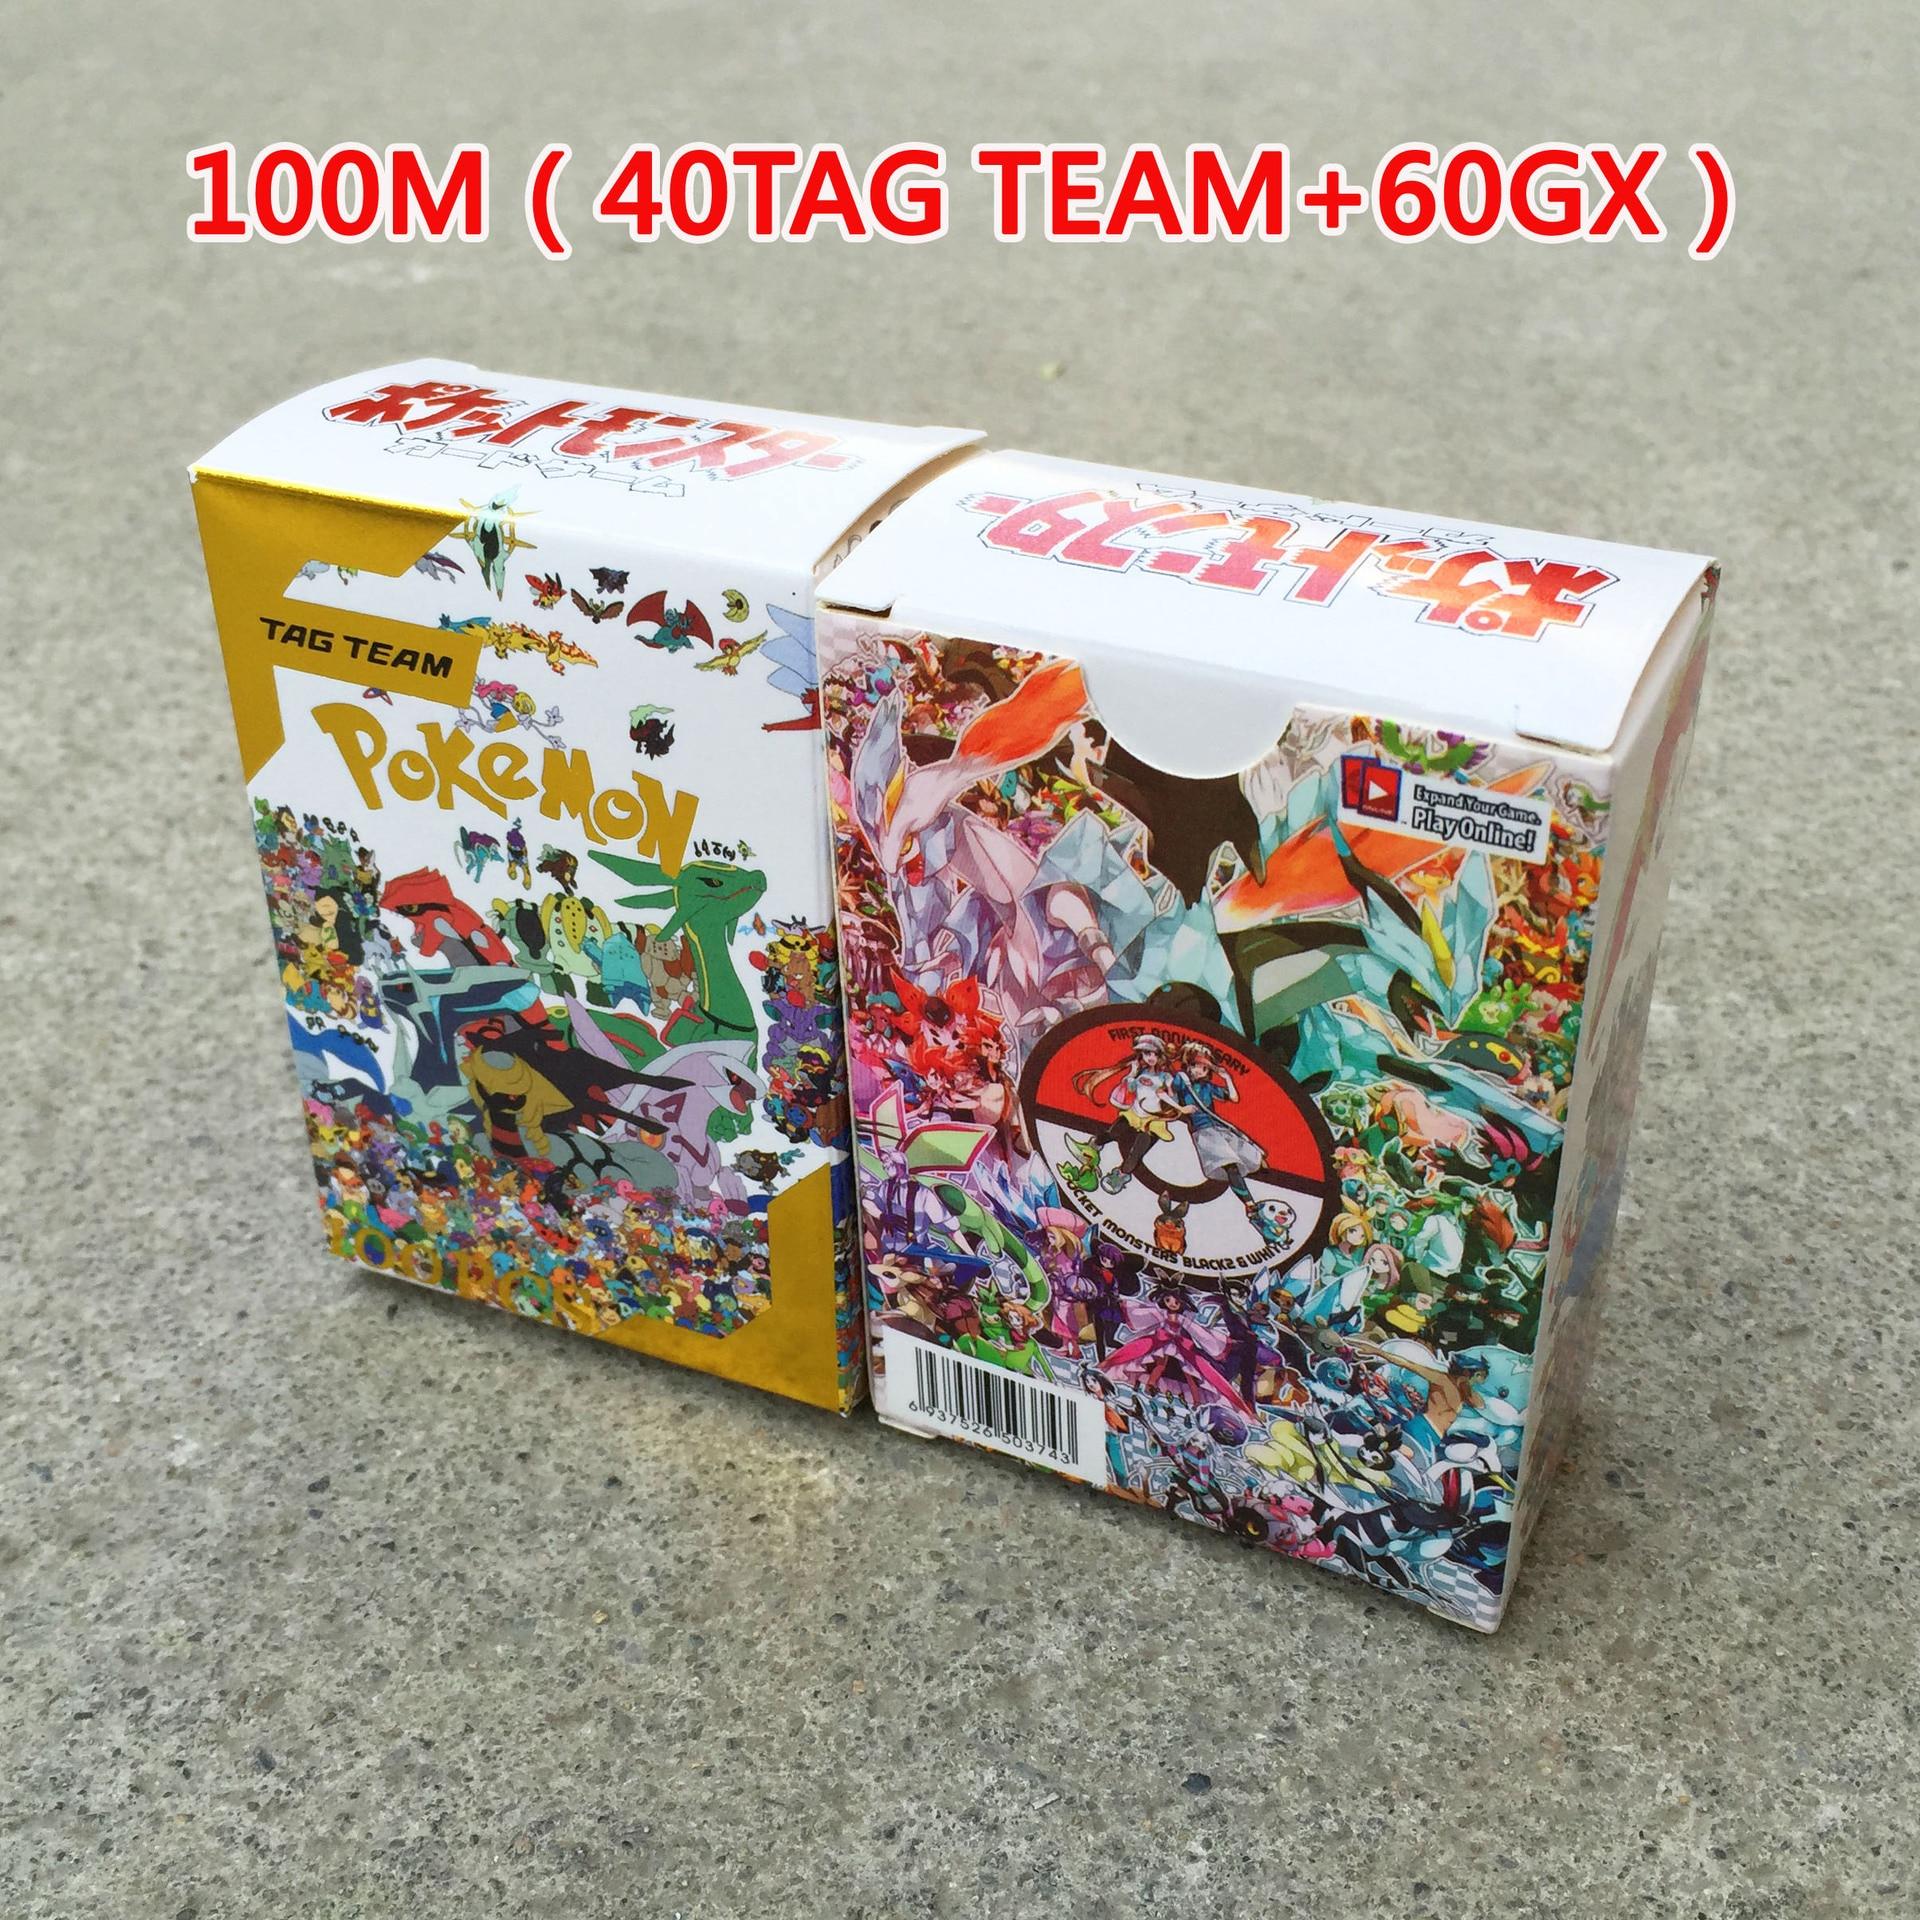 sticker panini 10517697 boxing anime stickers children hobbies cards toy boys girls TAKARA TOMY Pokemon New 100pcs Tag Team Battle Toys Hobbies Collectibles Game Collection Anime Cards for Children Christmas Gift